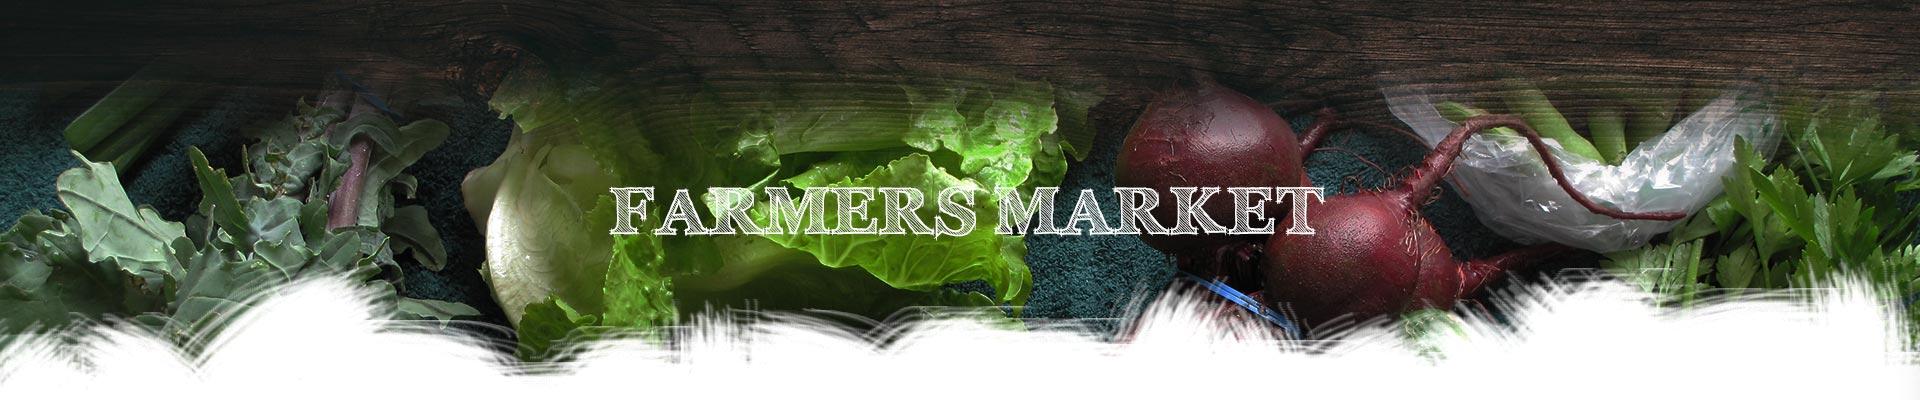 farmersmarket_heading